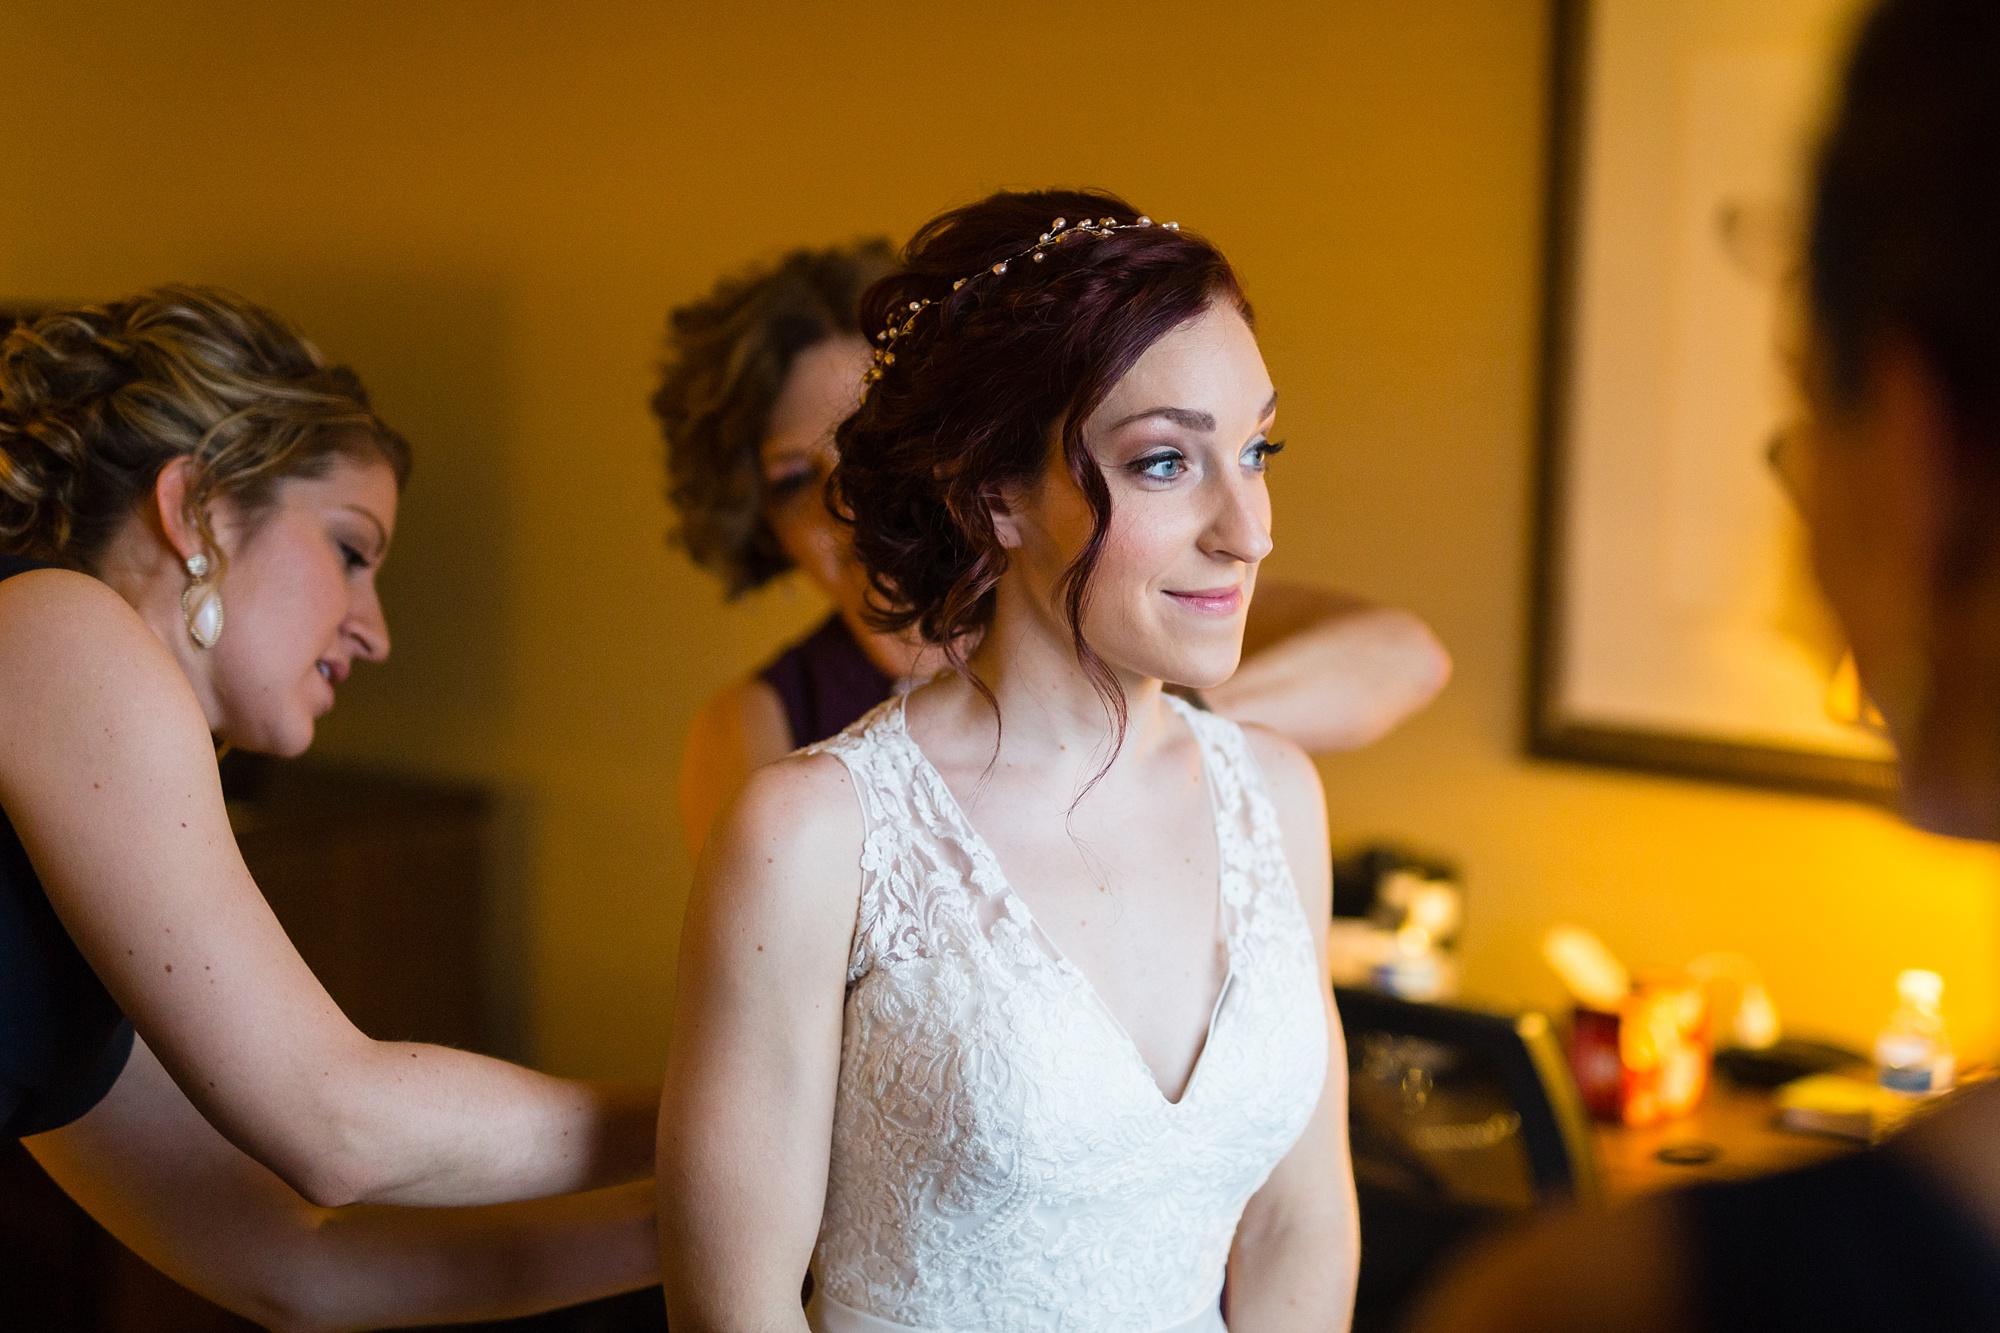 Brandon_Shafer_Photography_Lauren_Ethan_New_Vintage_Place_Grand_Rapids_Wedding_0013.jpg